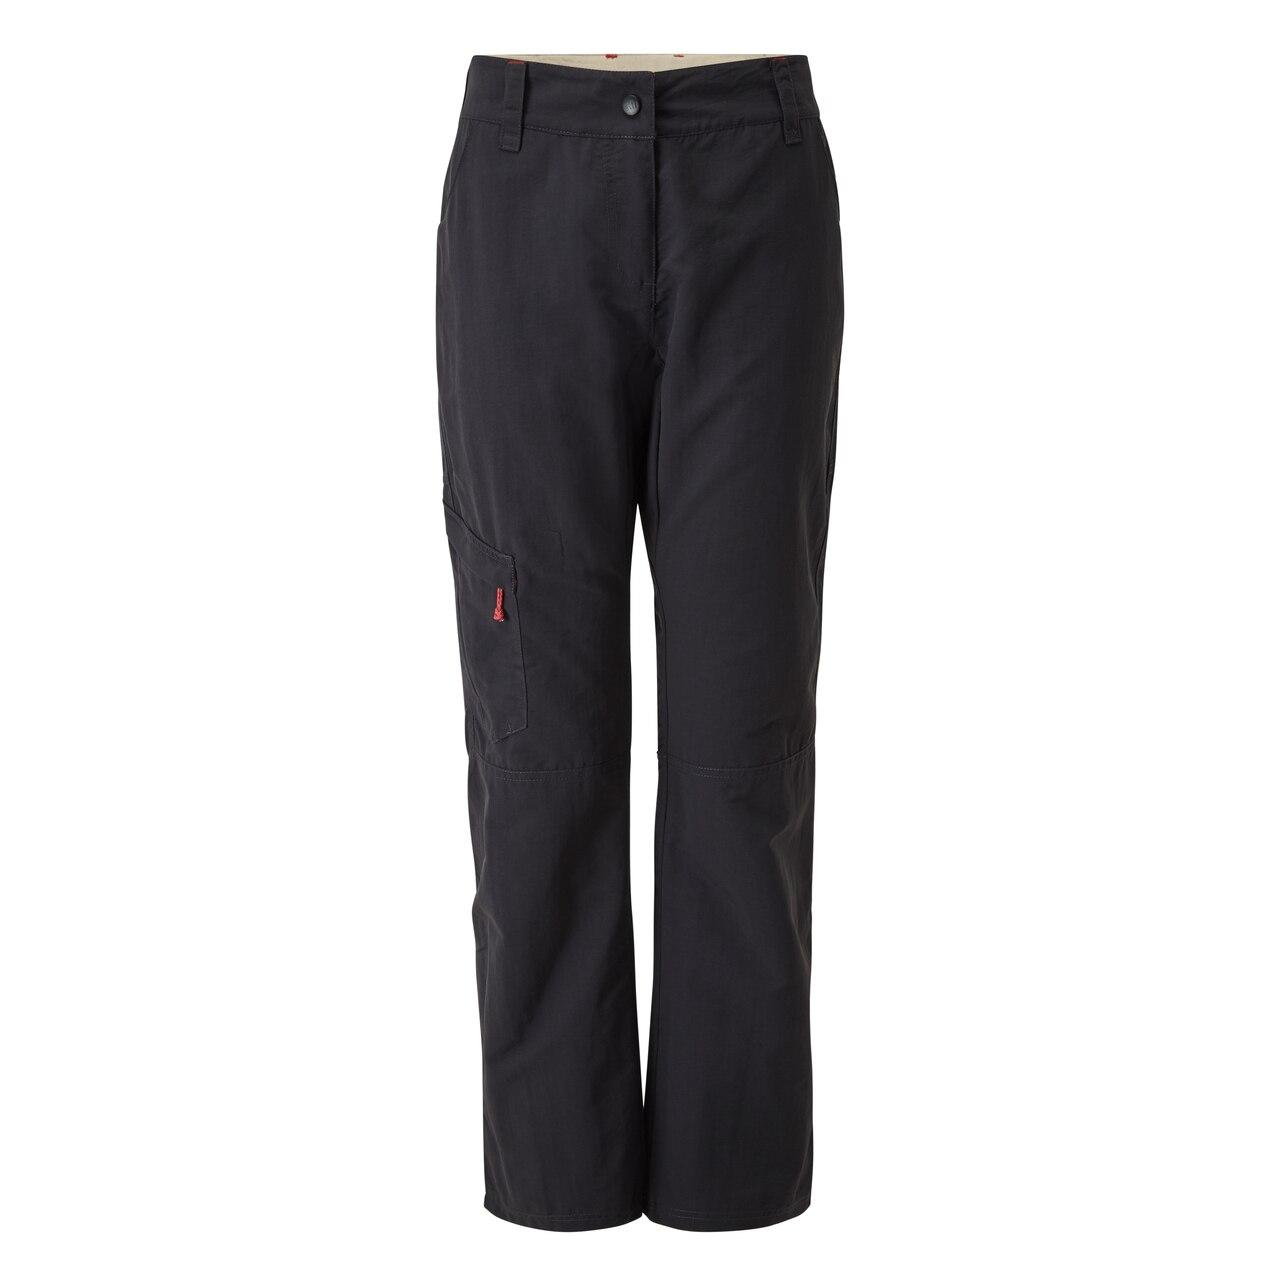 Women's UV Tec Trousers - UV014W-GRA01-1.jpg